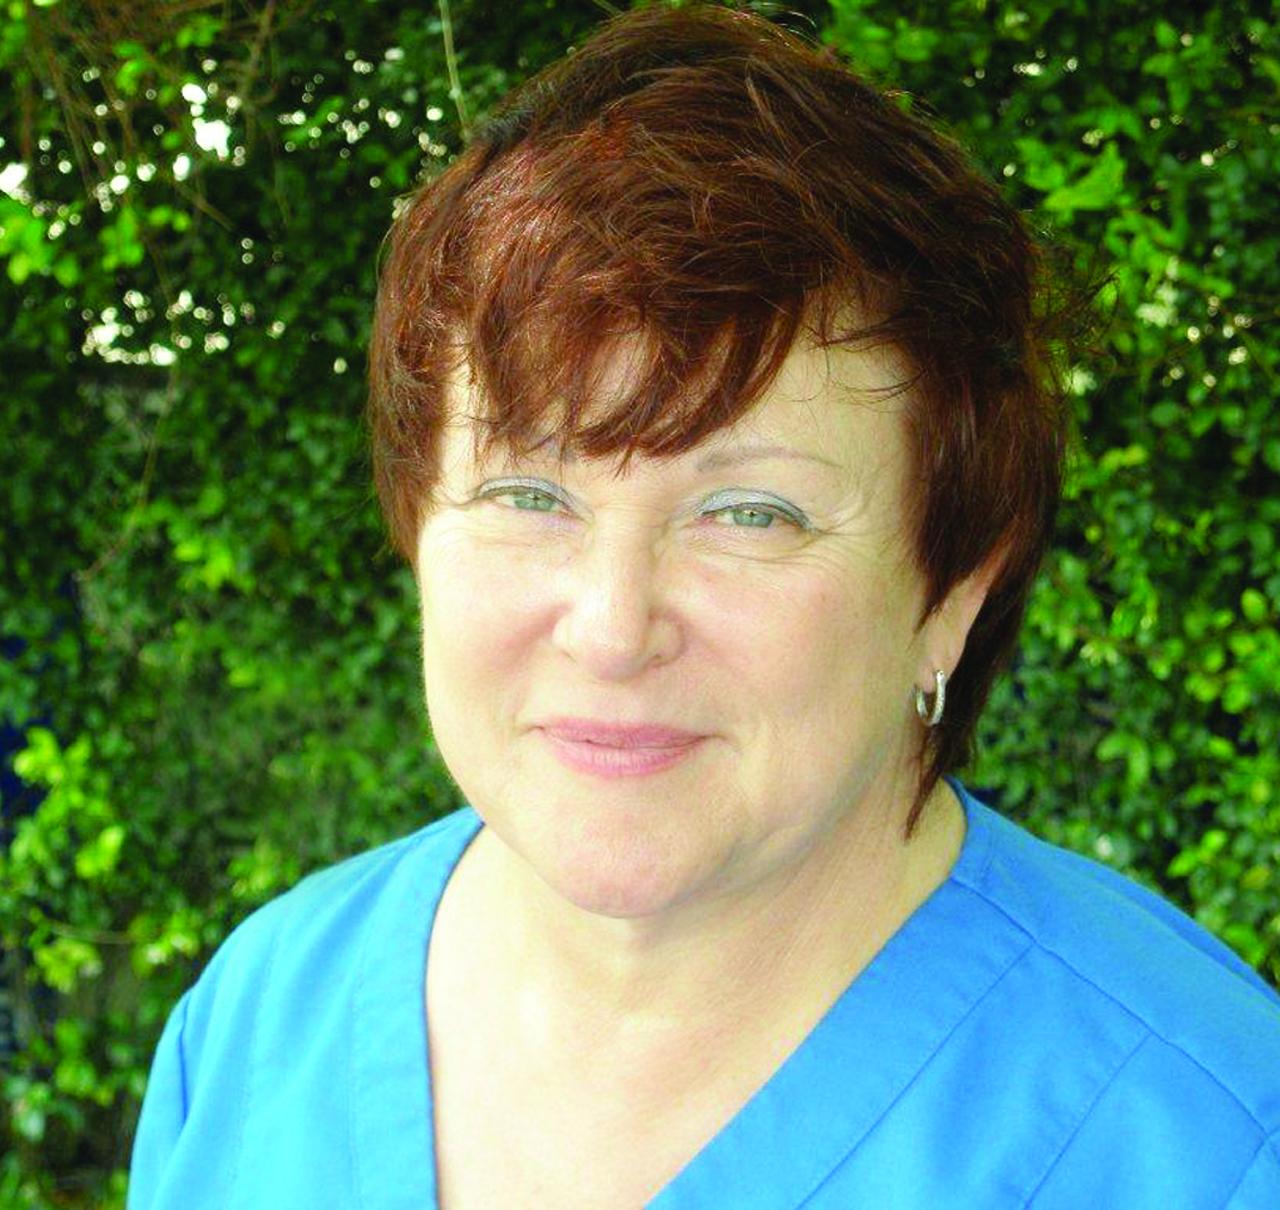 Heart Palpitations & Preventative Care – Nadine's Story